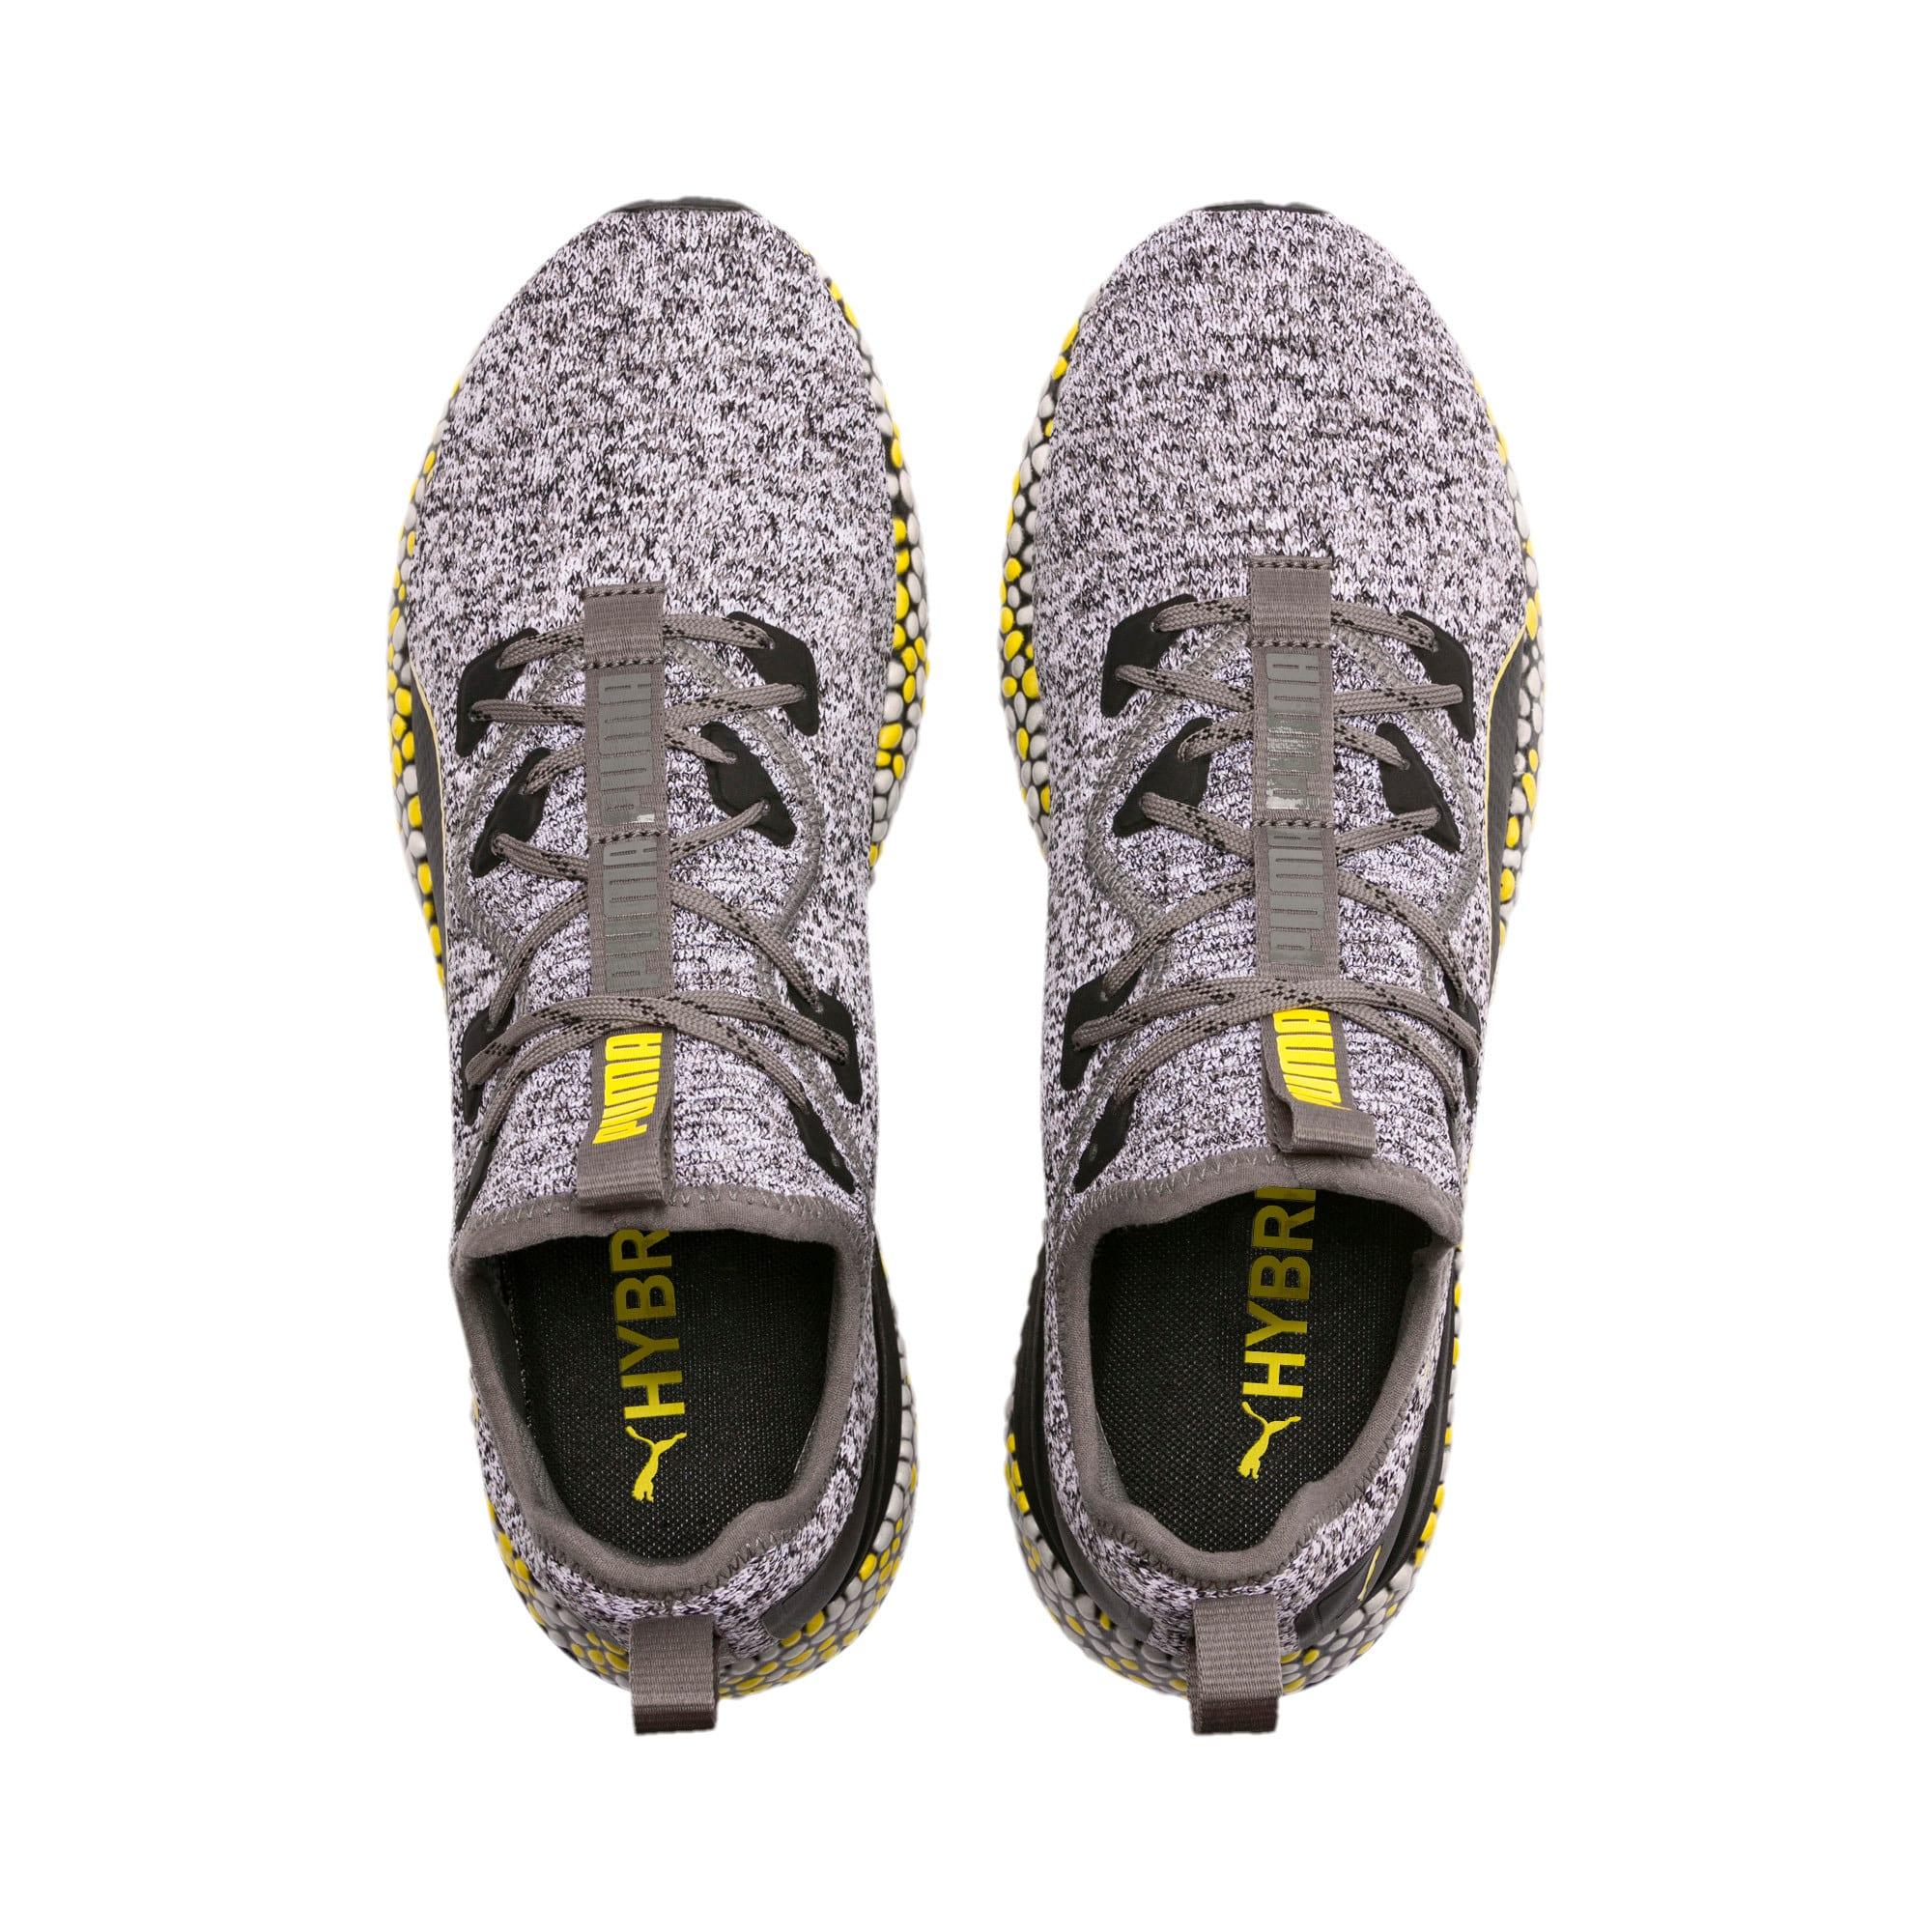 Thumbnail 6 of Hybrid Runner Men's Running Shoes, Black-White-Blazing Yellow, medium